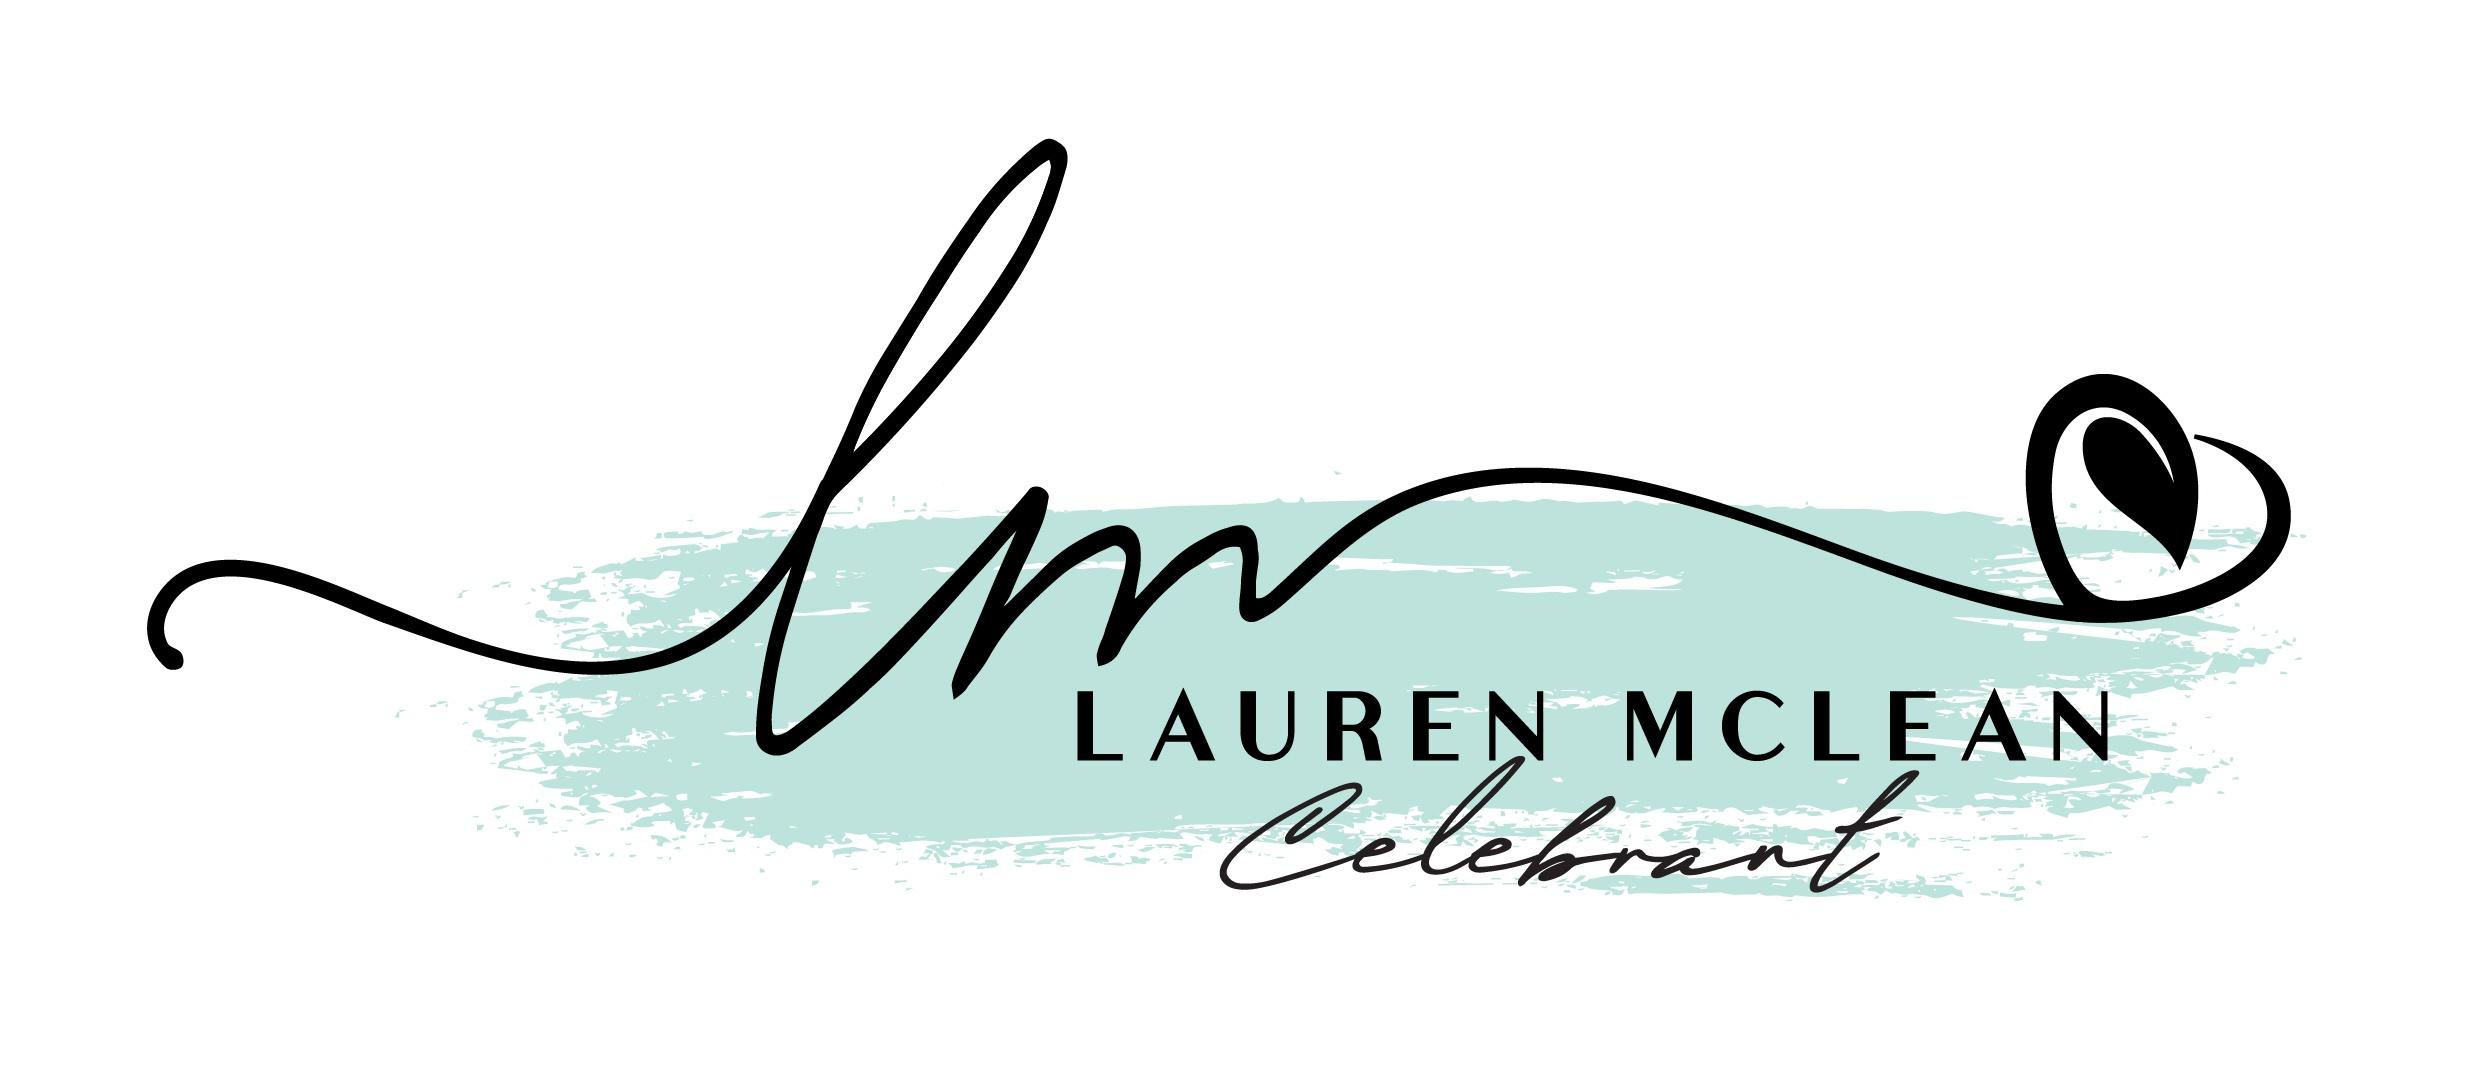 Lauren McLean Celebrant Logo Design